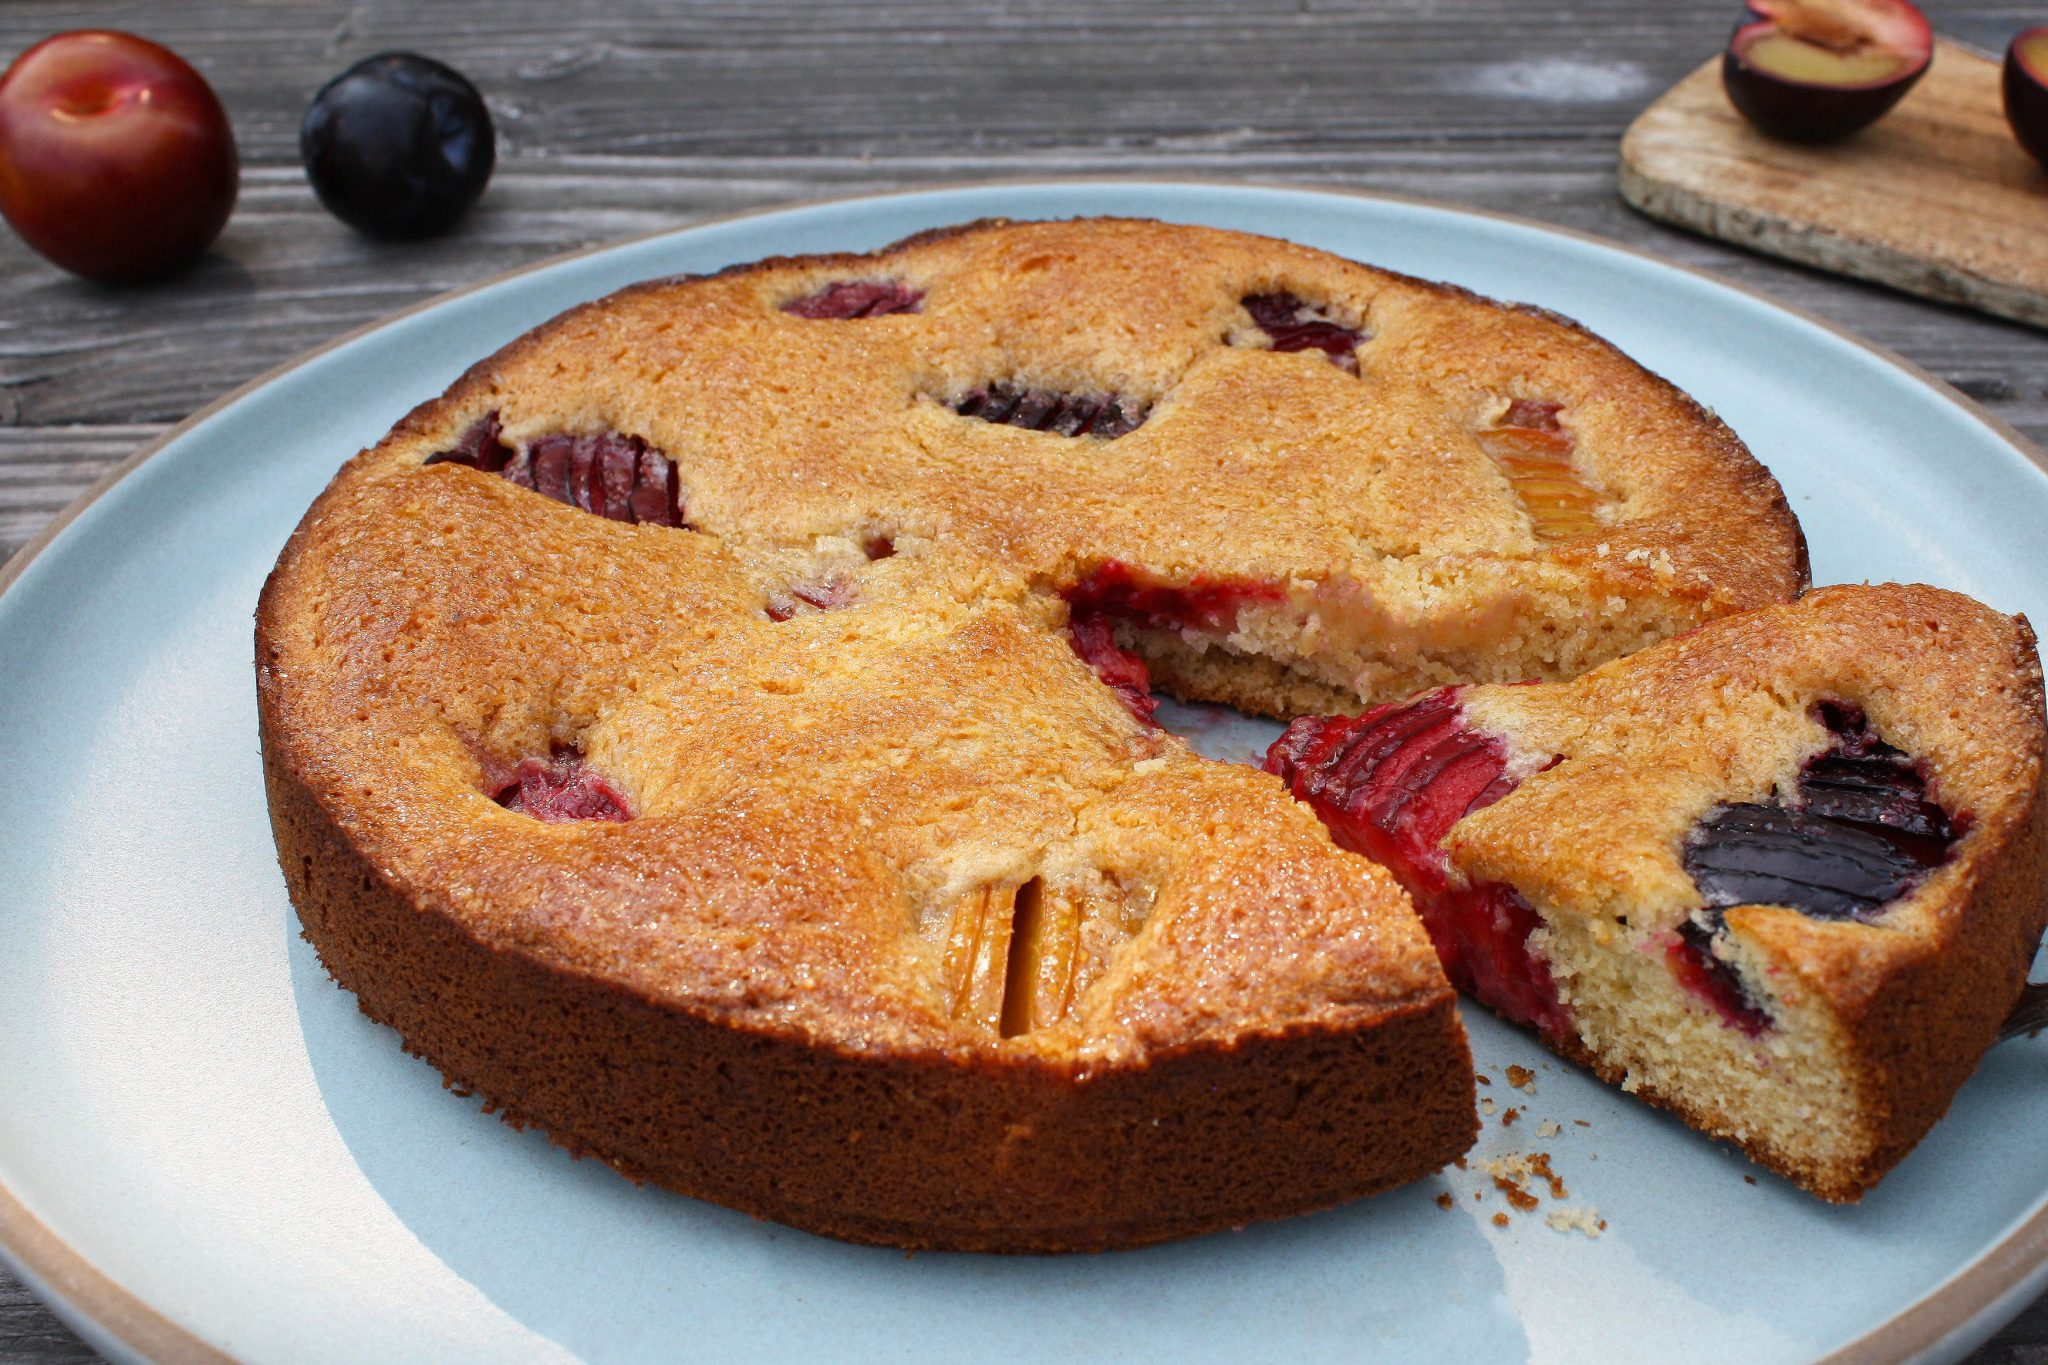 Sunken Plum Cake